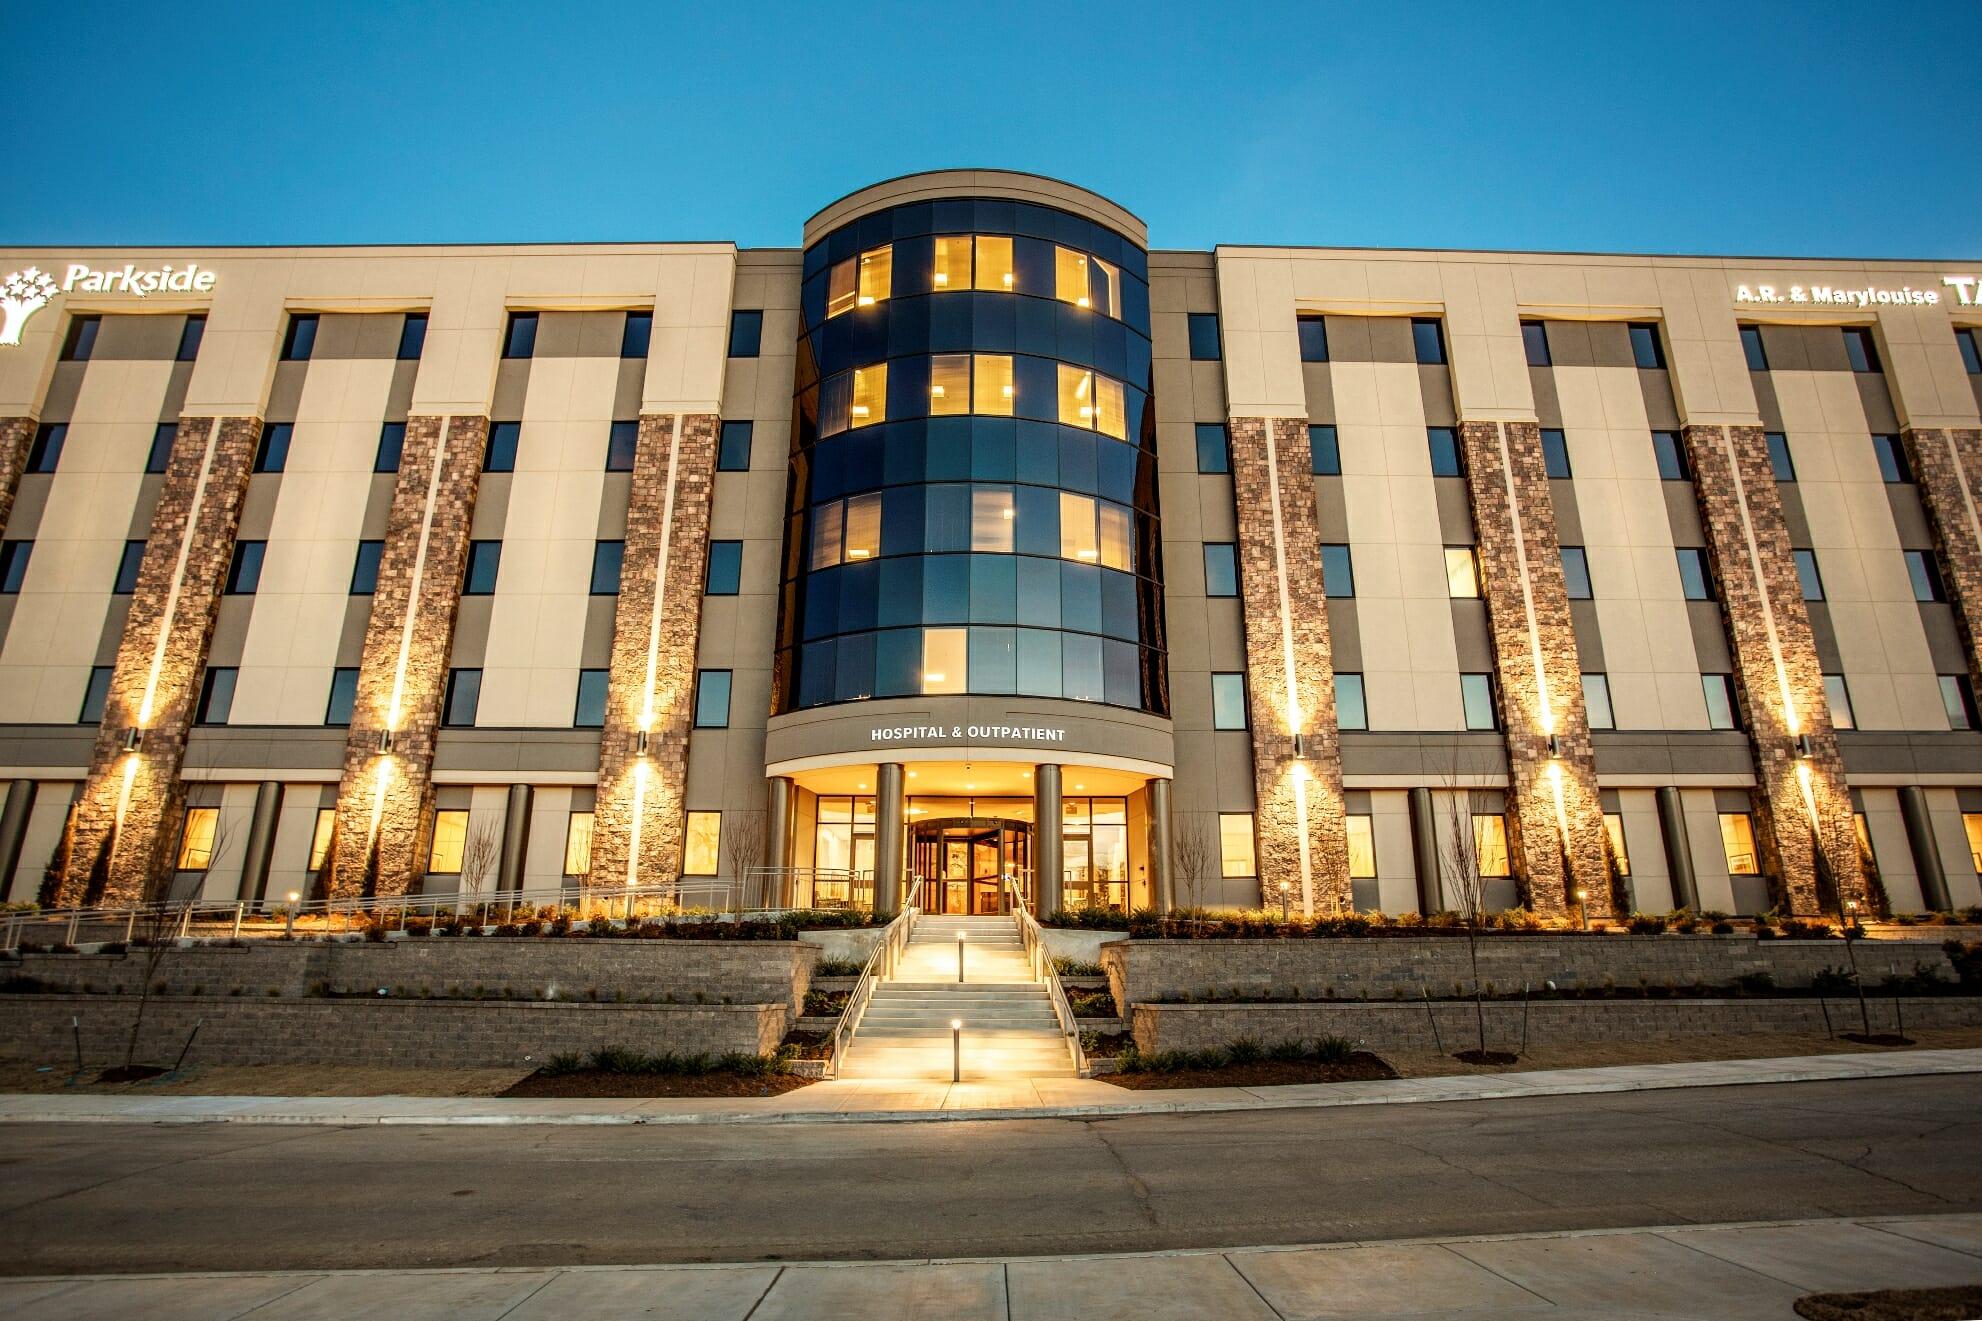 Parkside's future hospital